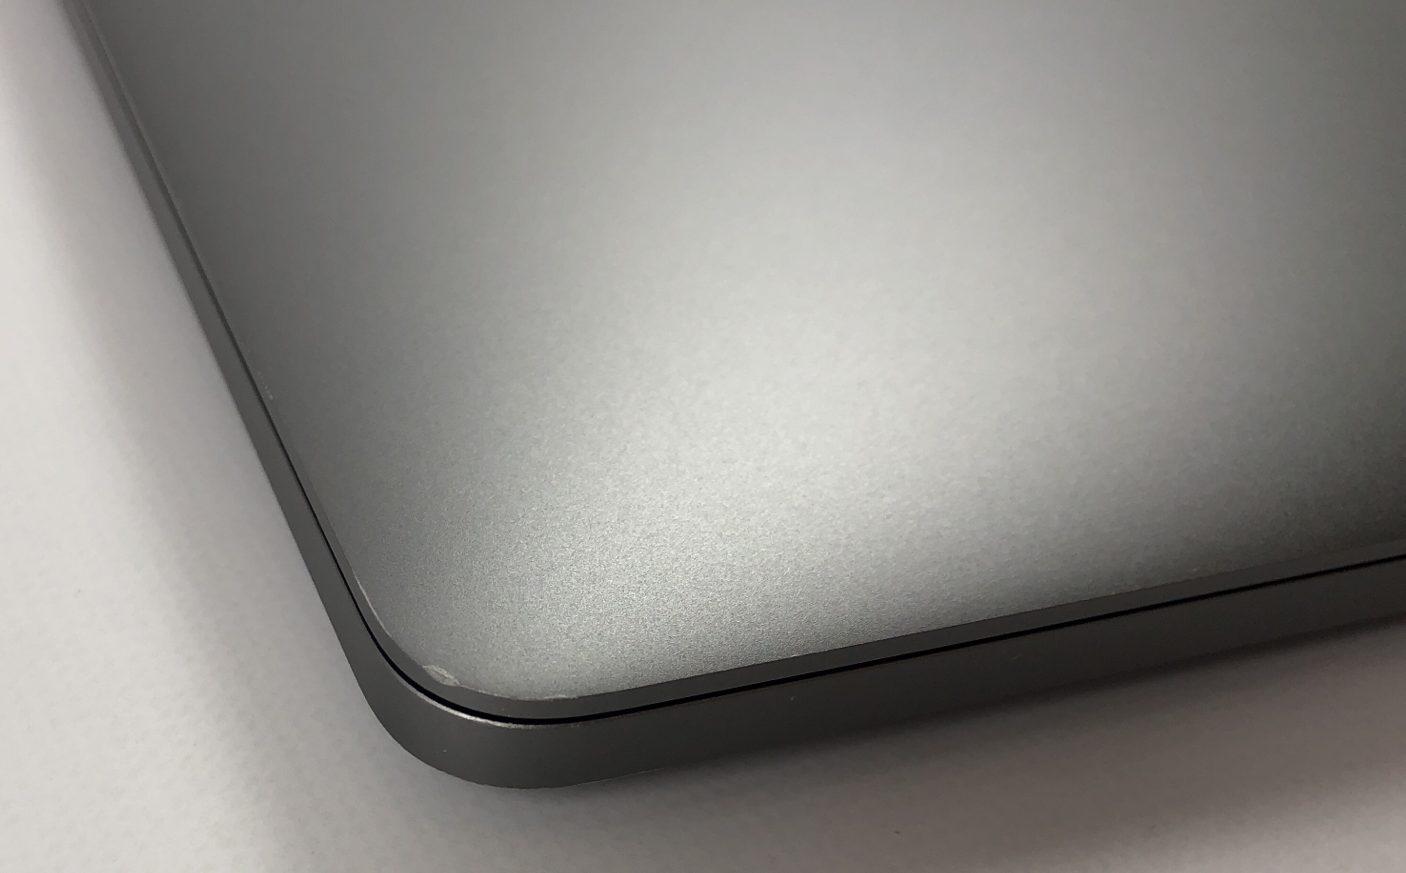 "MacBook Pro 15"" Touch Bar Mid 2019 (Intel 8-Core i9 2.3 GHz 16 GB RAM 512 GB SSD), Space Gray, Intel 8-Core i9 2.3 GHz, 16 GB RAM, 512 GB SSD, imagen 3"